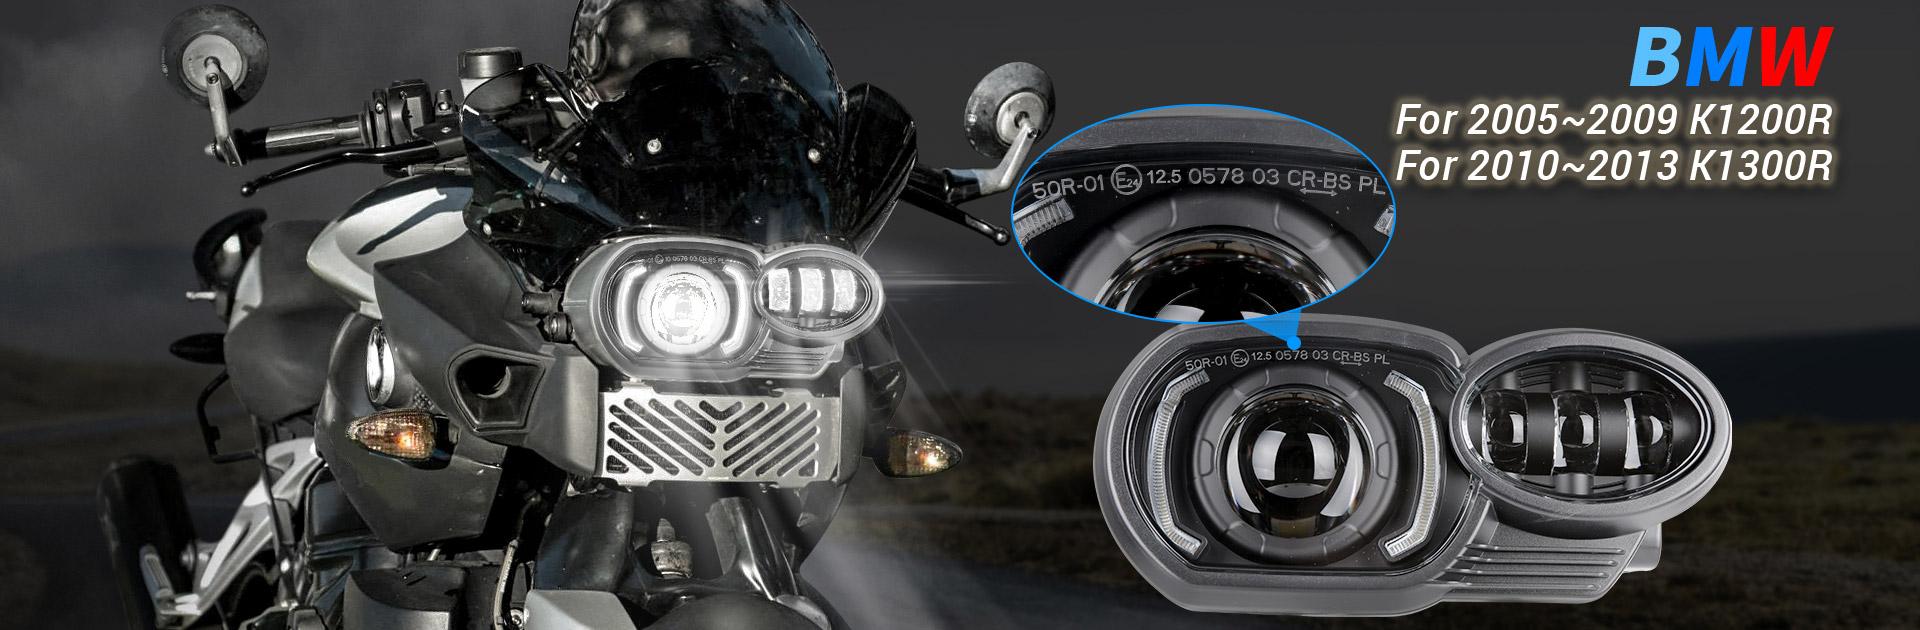 2005-2009 BMW K1200R Led Headlight